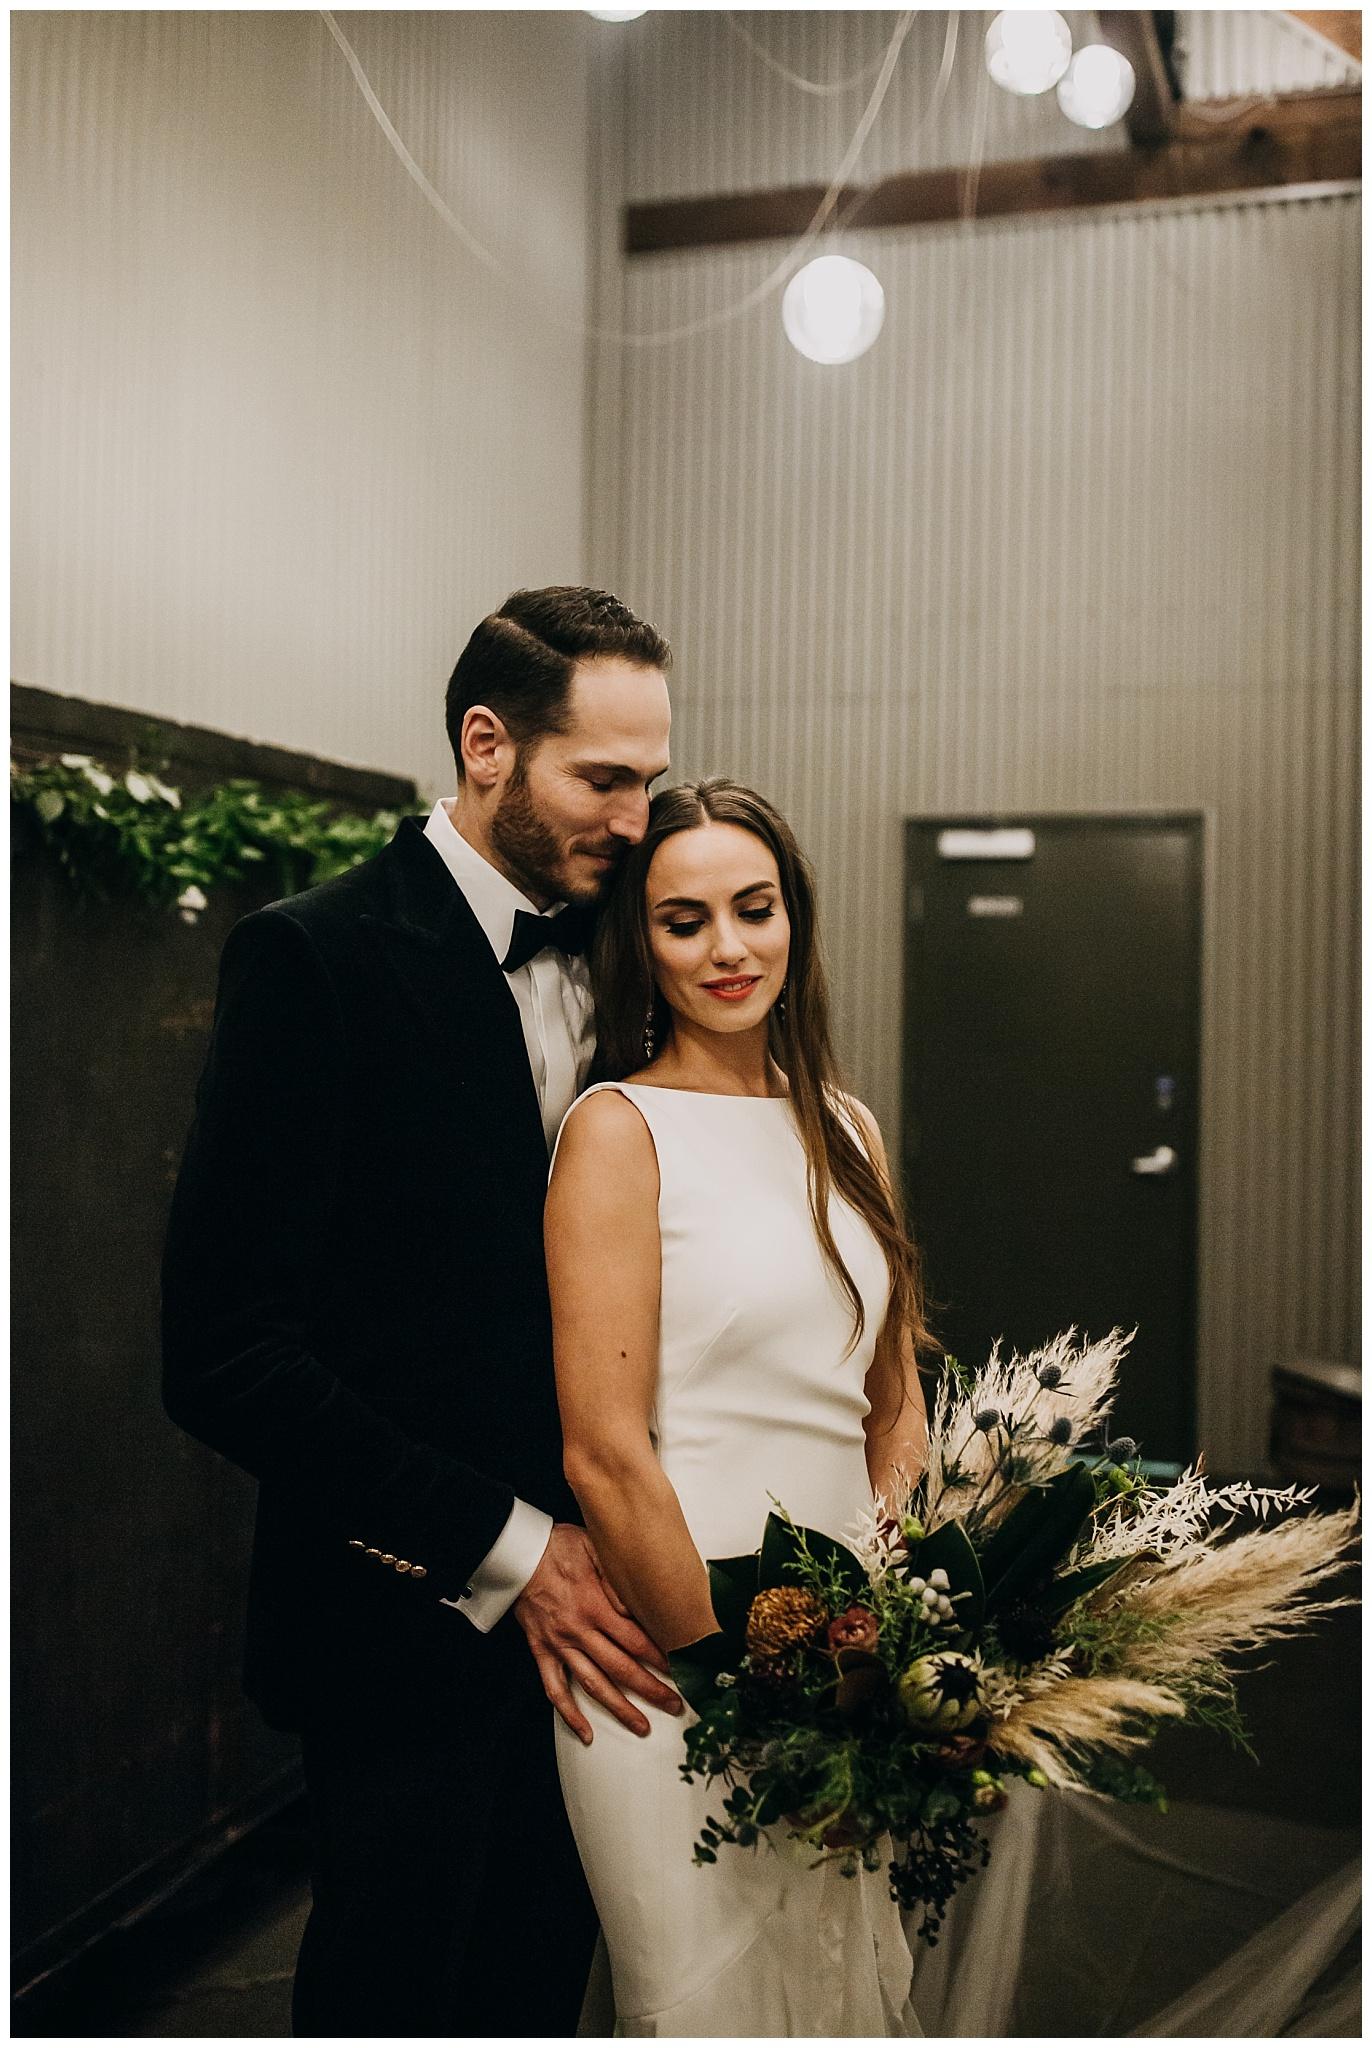 bride and groom wedding portrait inside settlement building